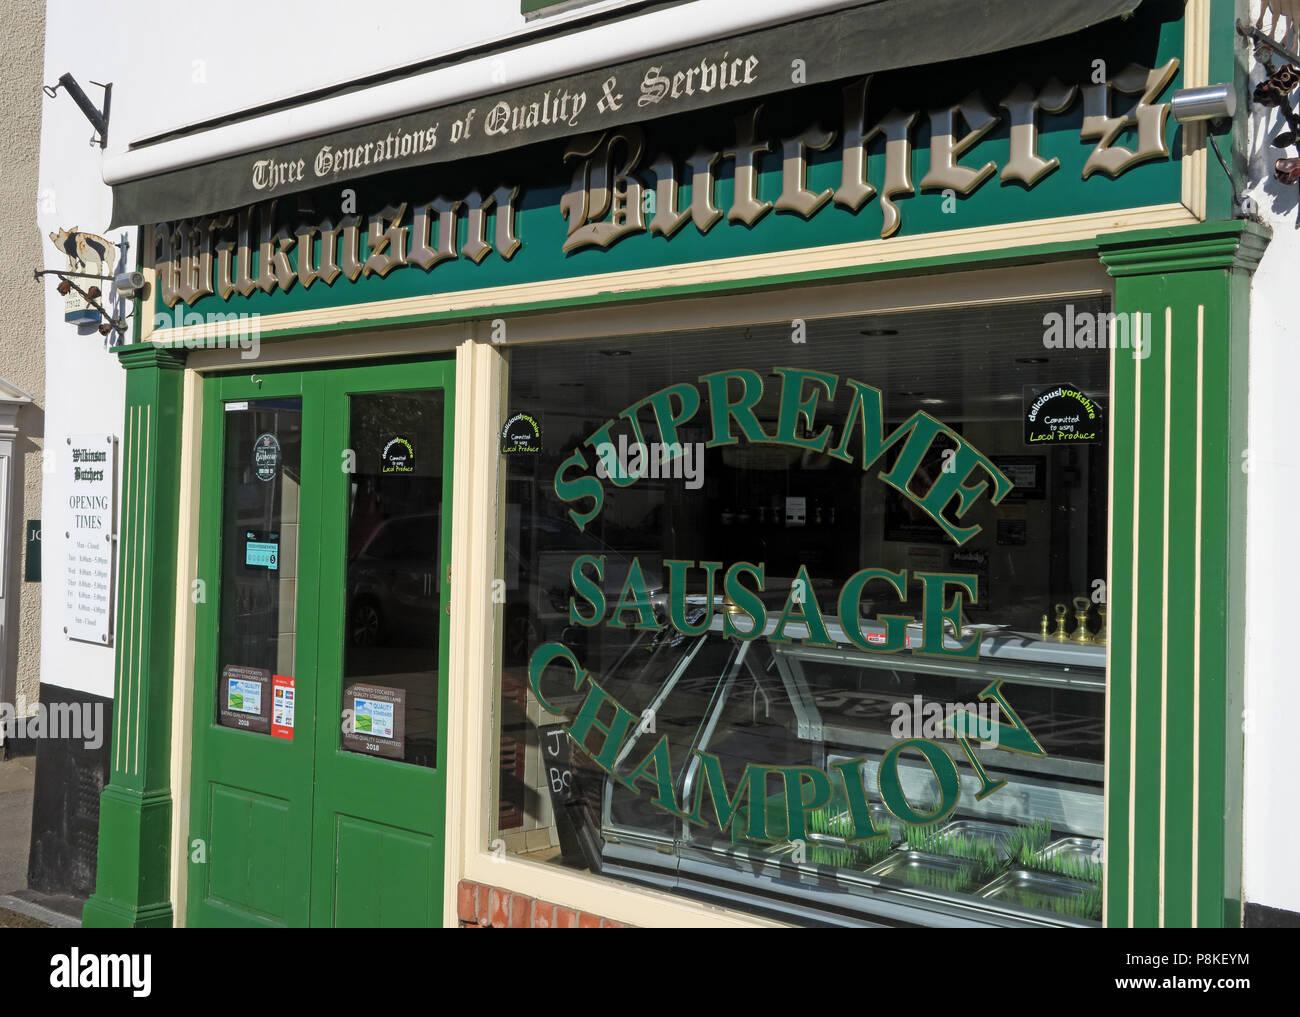 Dieses Stockfoto: Wilkinson Metzger, Bawtry Supreme Wurst Champion, Doncaster, South Yorkshire, England, Großbritannien - P8KEYM